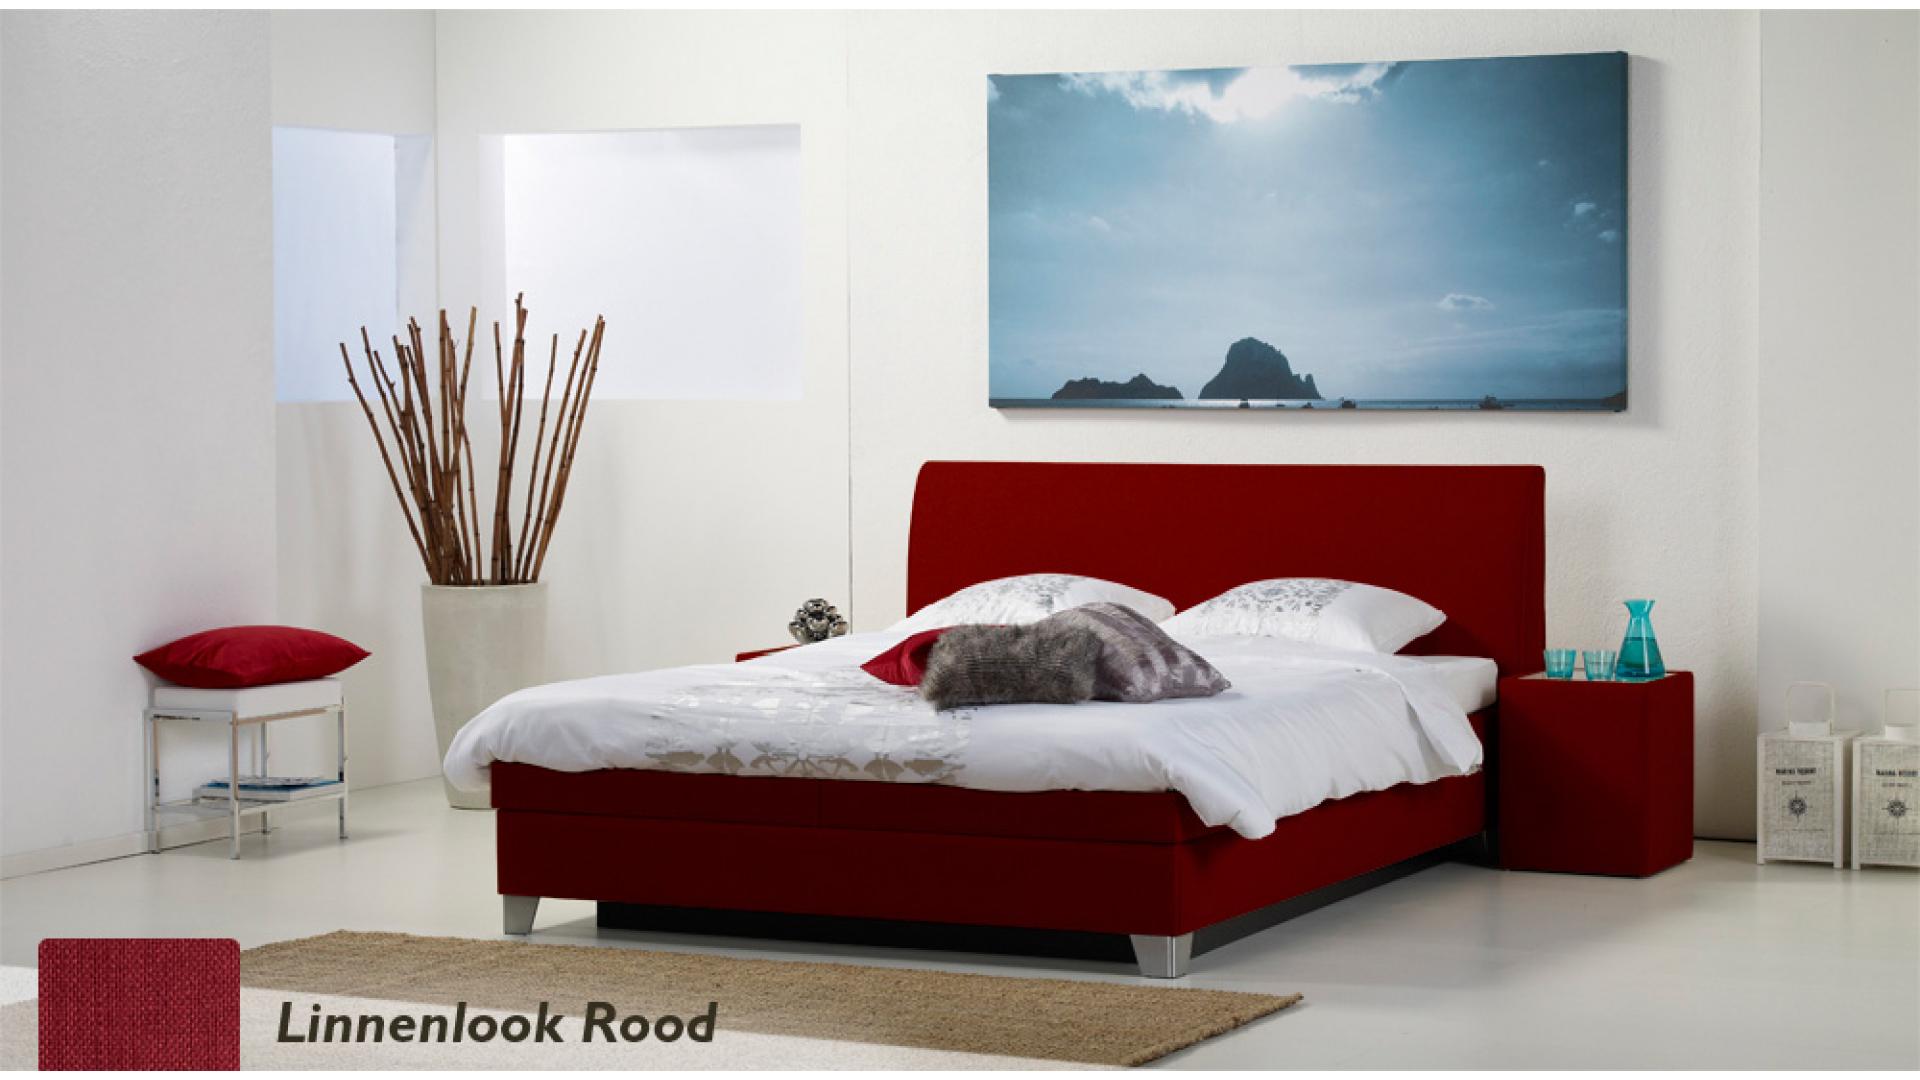 waterbed luxe box pro linnenlook rood